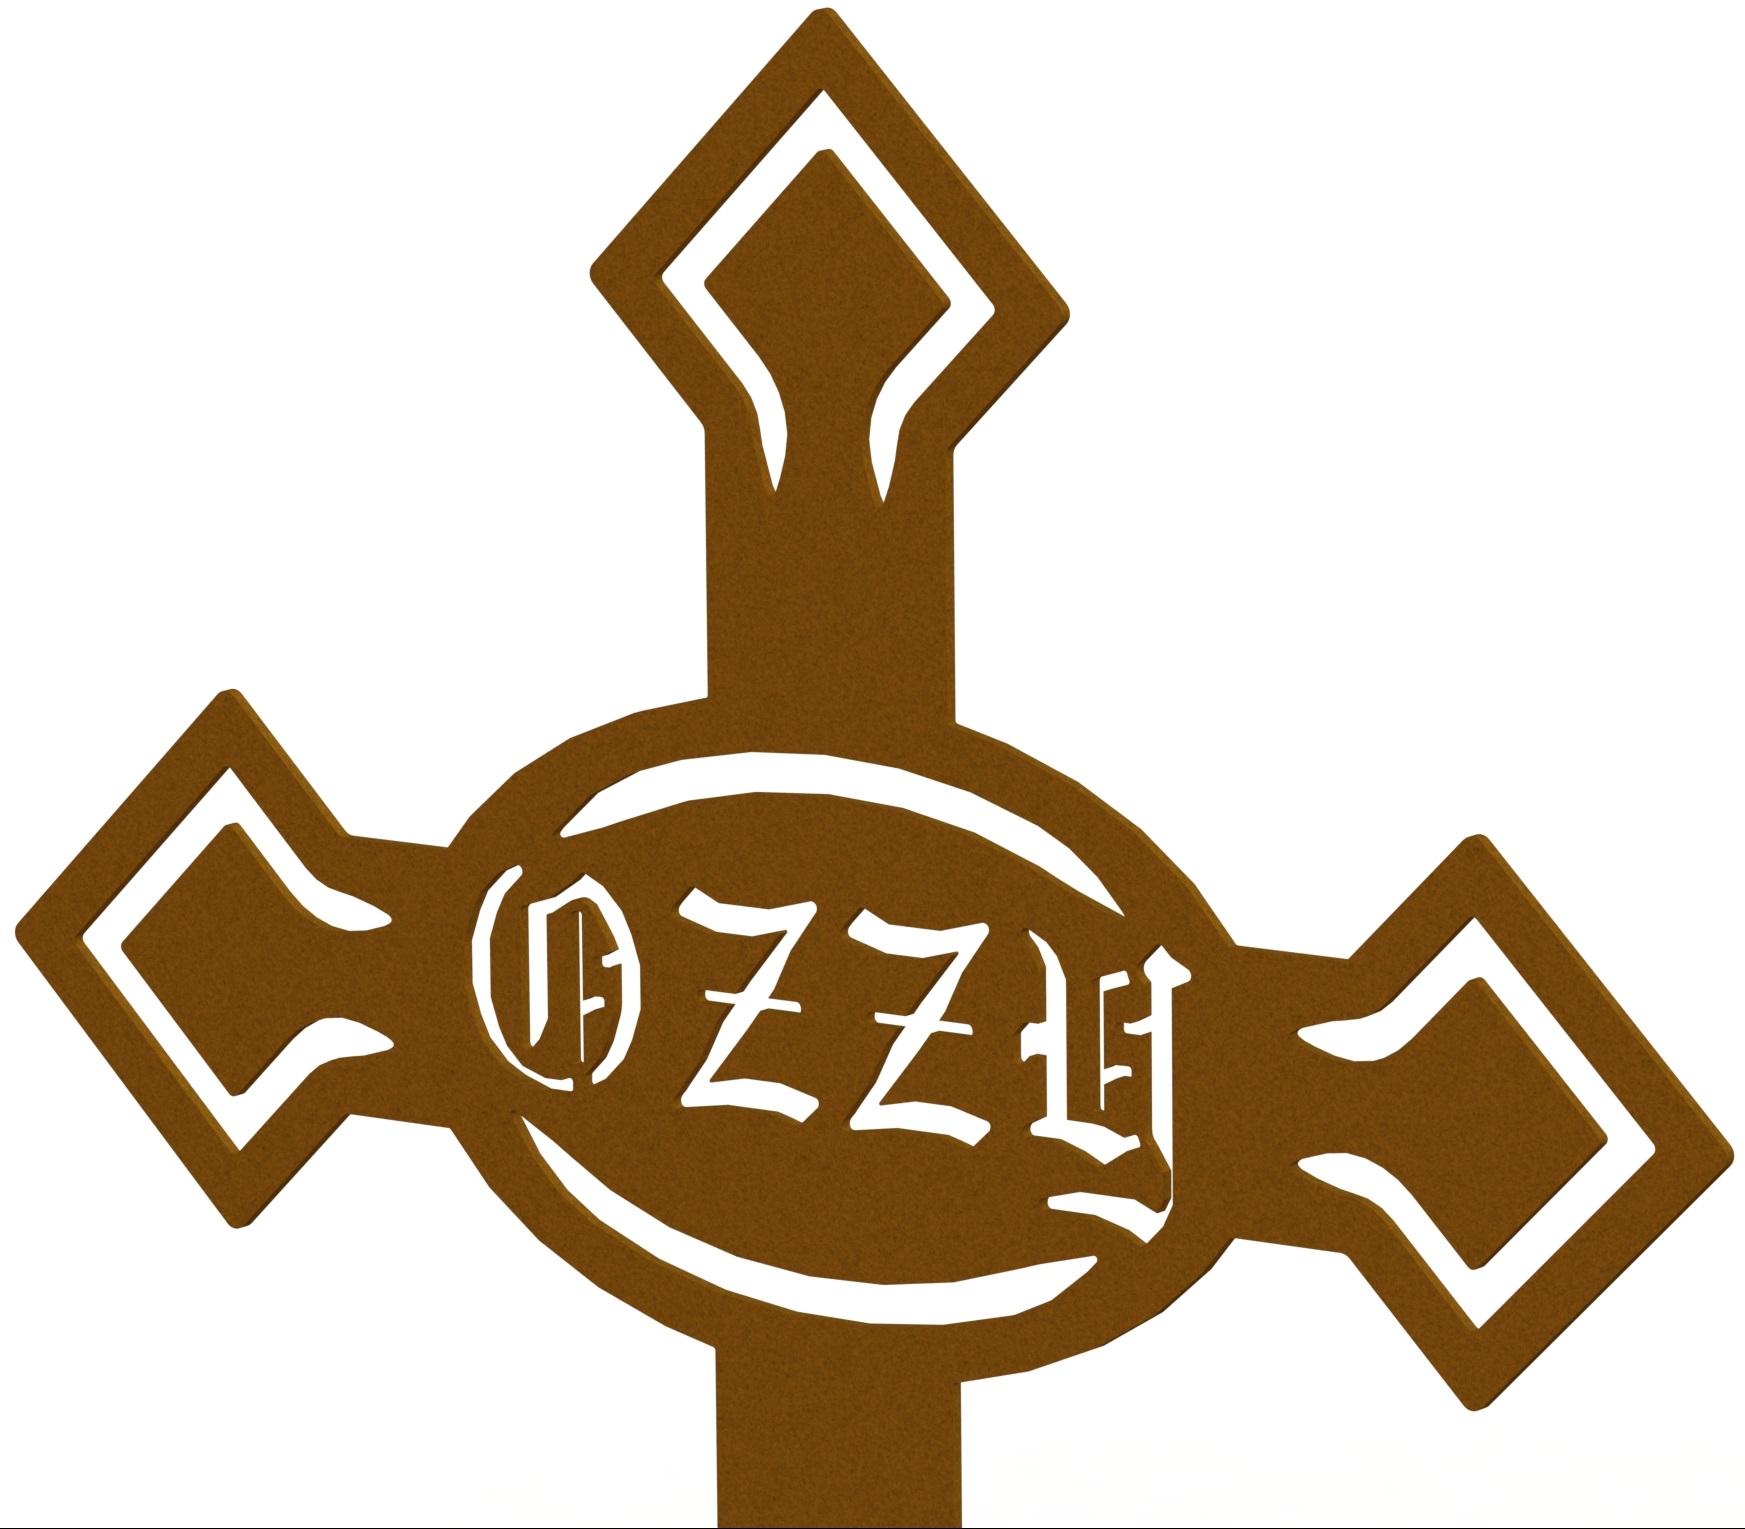 Ozzy Dog Grave Marker - RENDER CLOSEUP